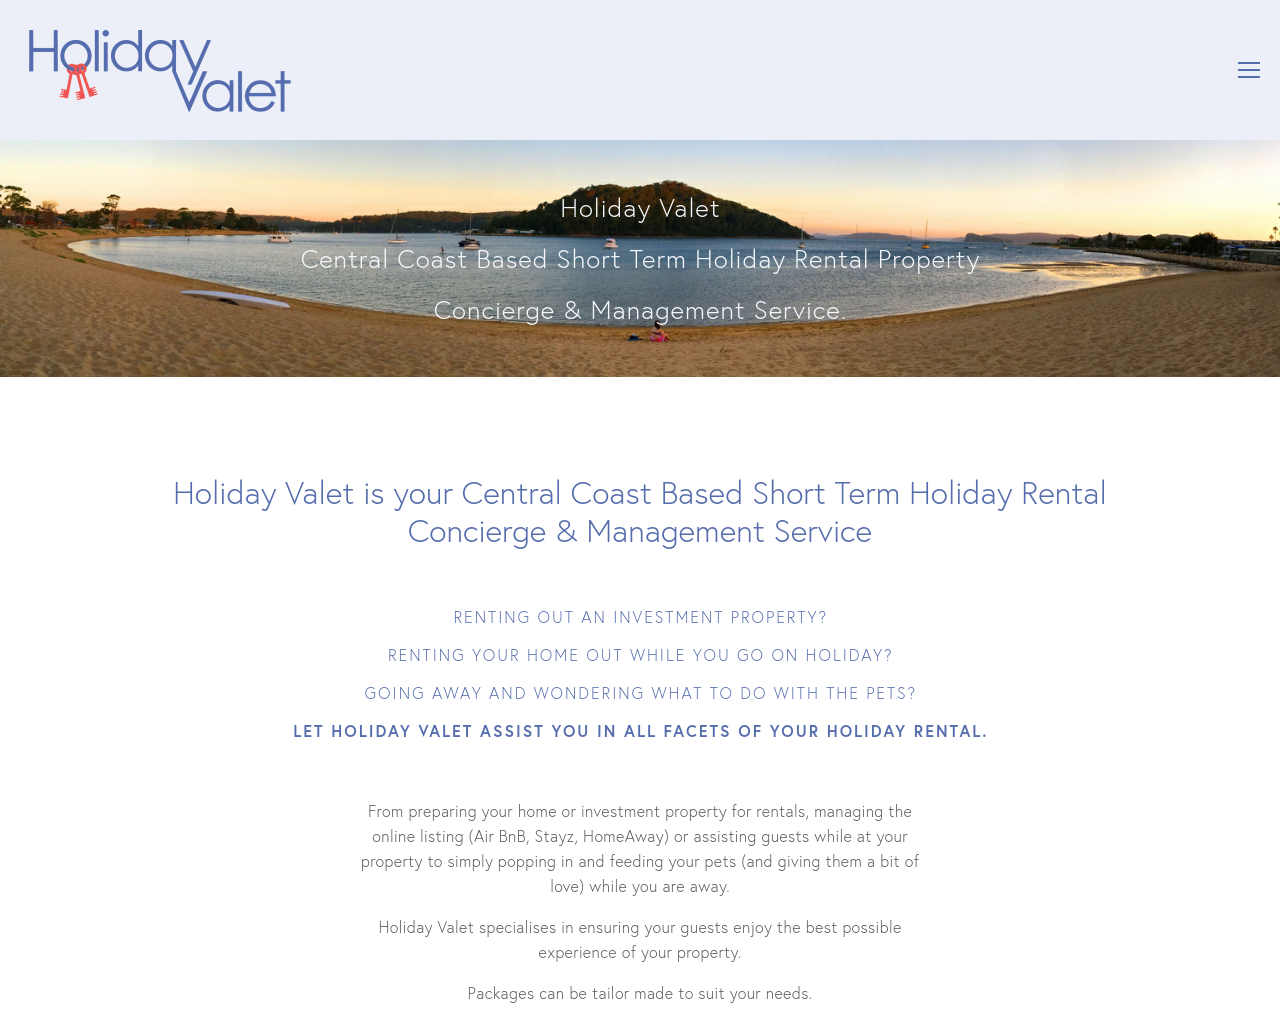 Holiday-Valet-Advertising-Reviews-Pricing